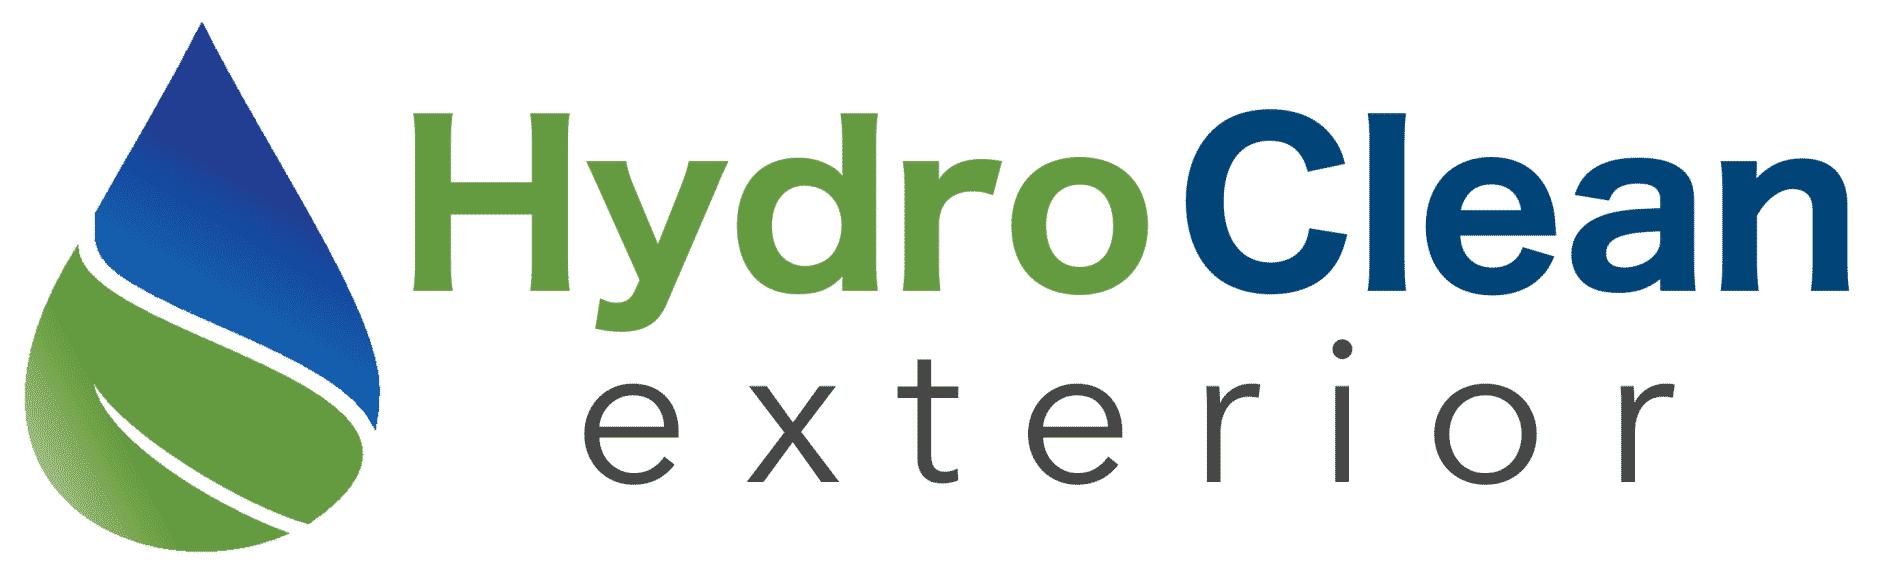 Hydro Clean Exterior Ltd